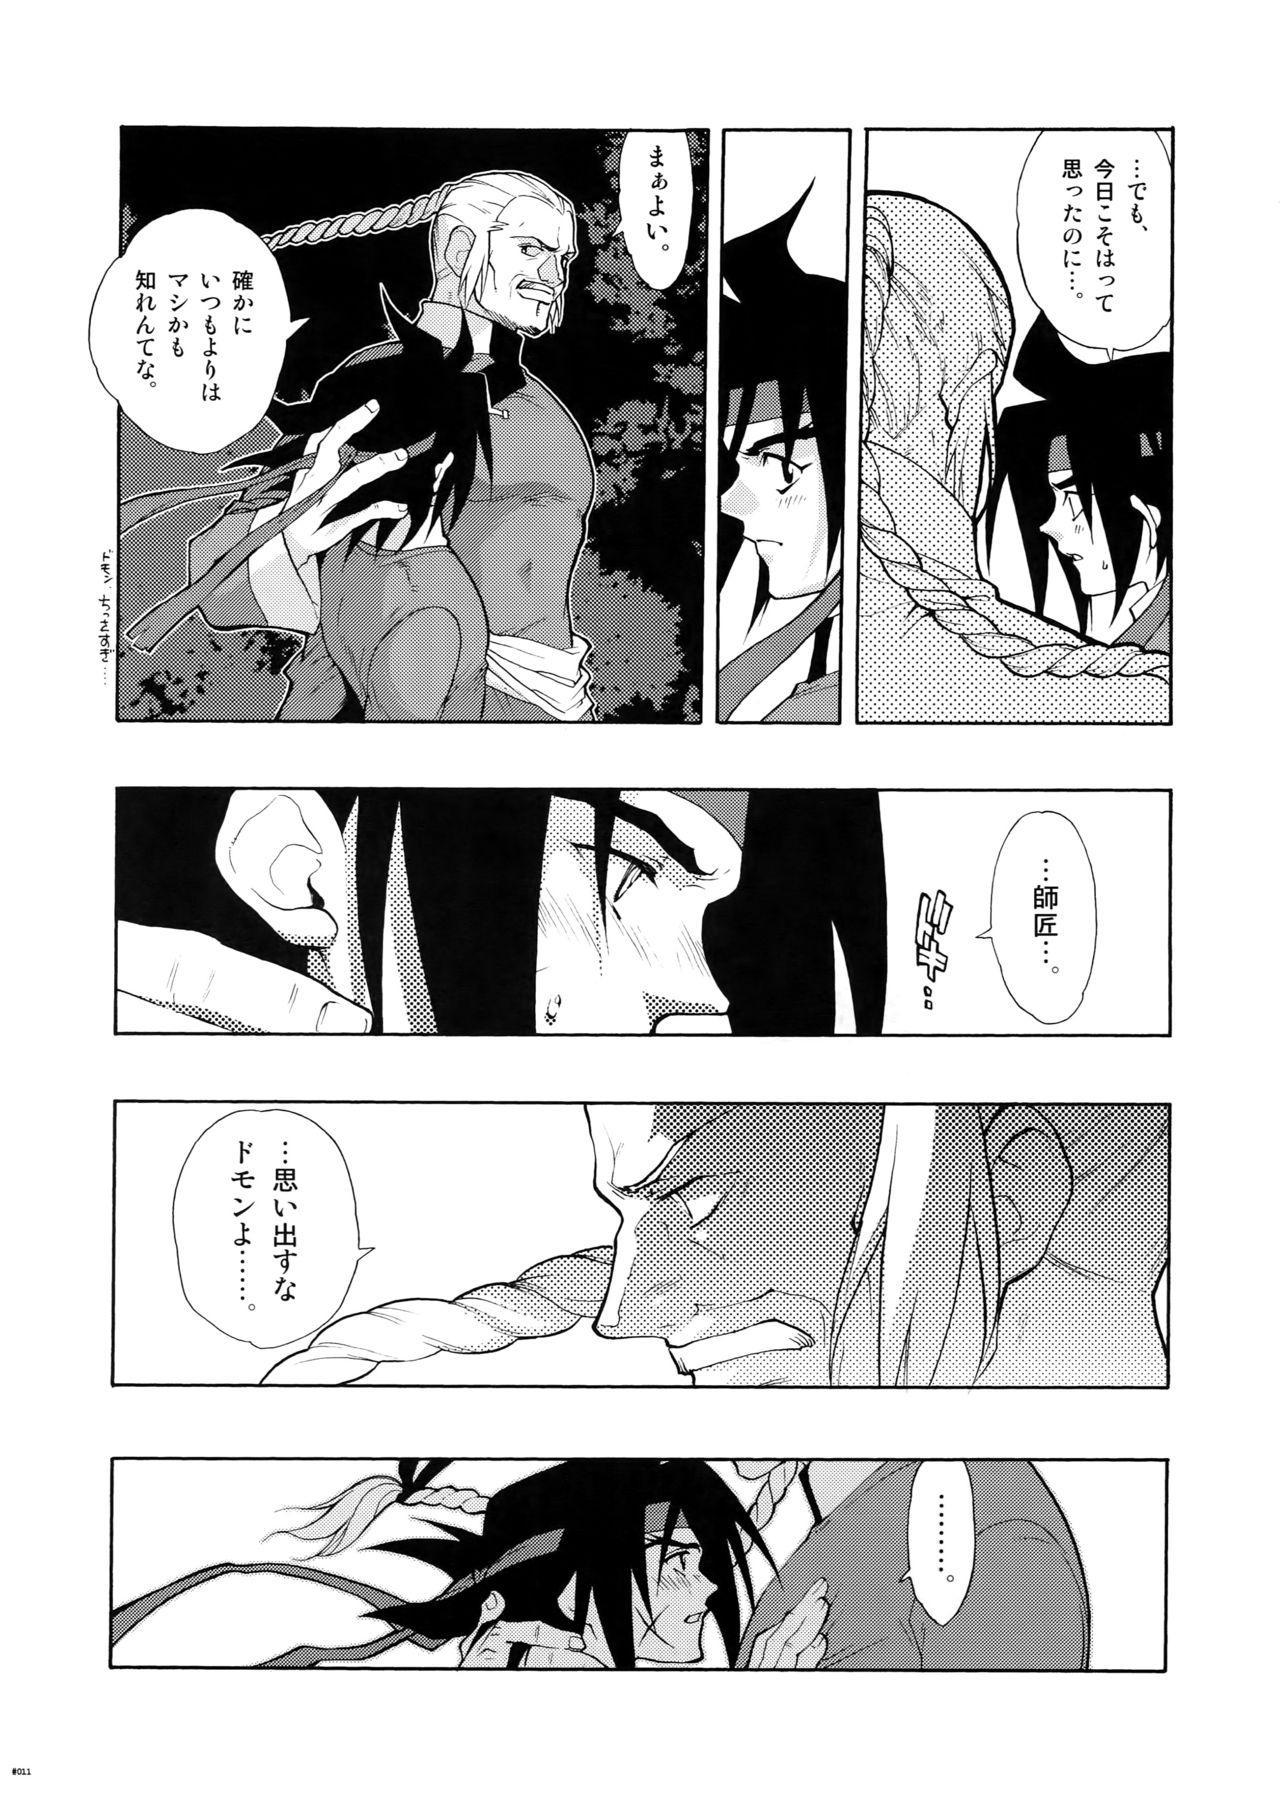 [Article 60 of Criminal Code (Shuhan)] G-gan Josei-Muke Sairoku-Shuu (G Gundam) 10